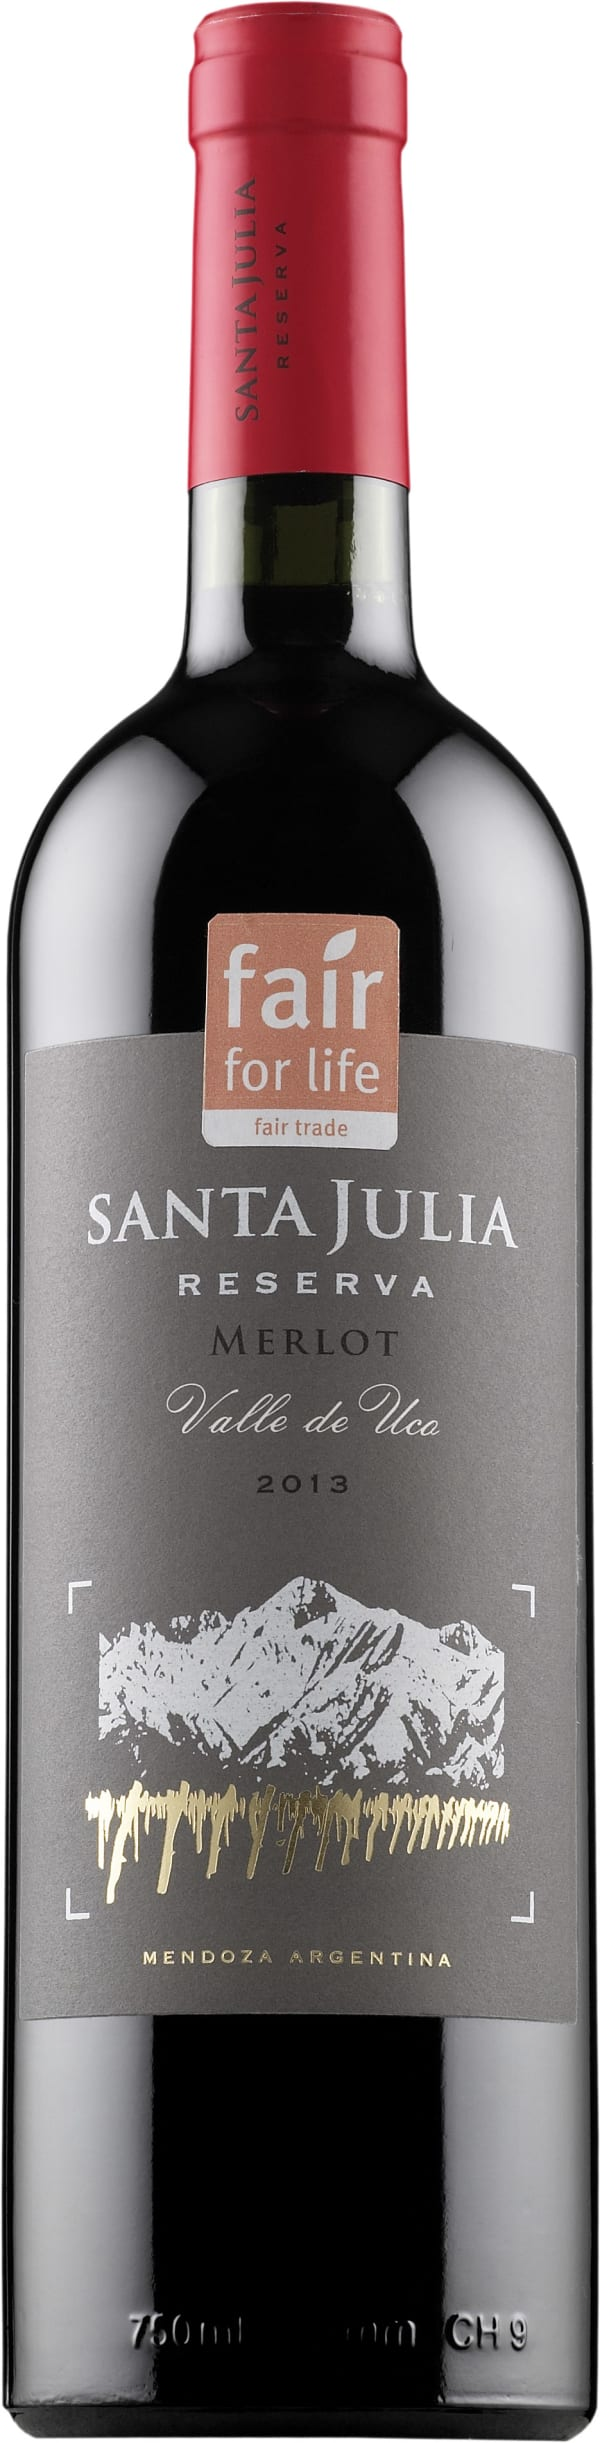 Santa Julia Merlot Reserva 2014